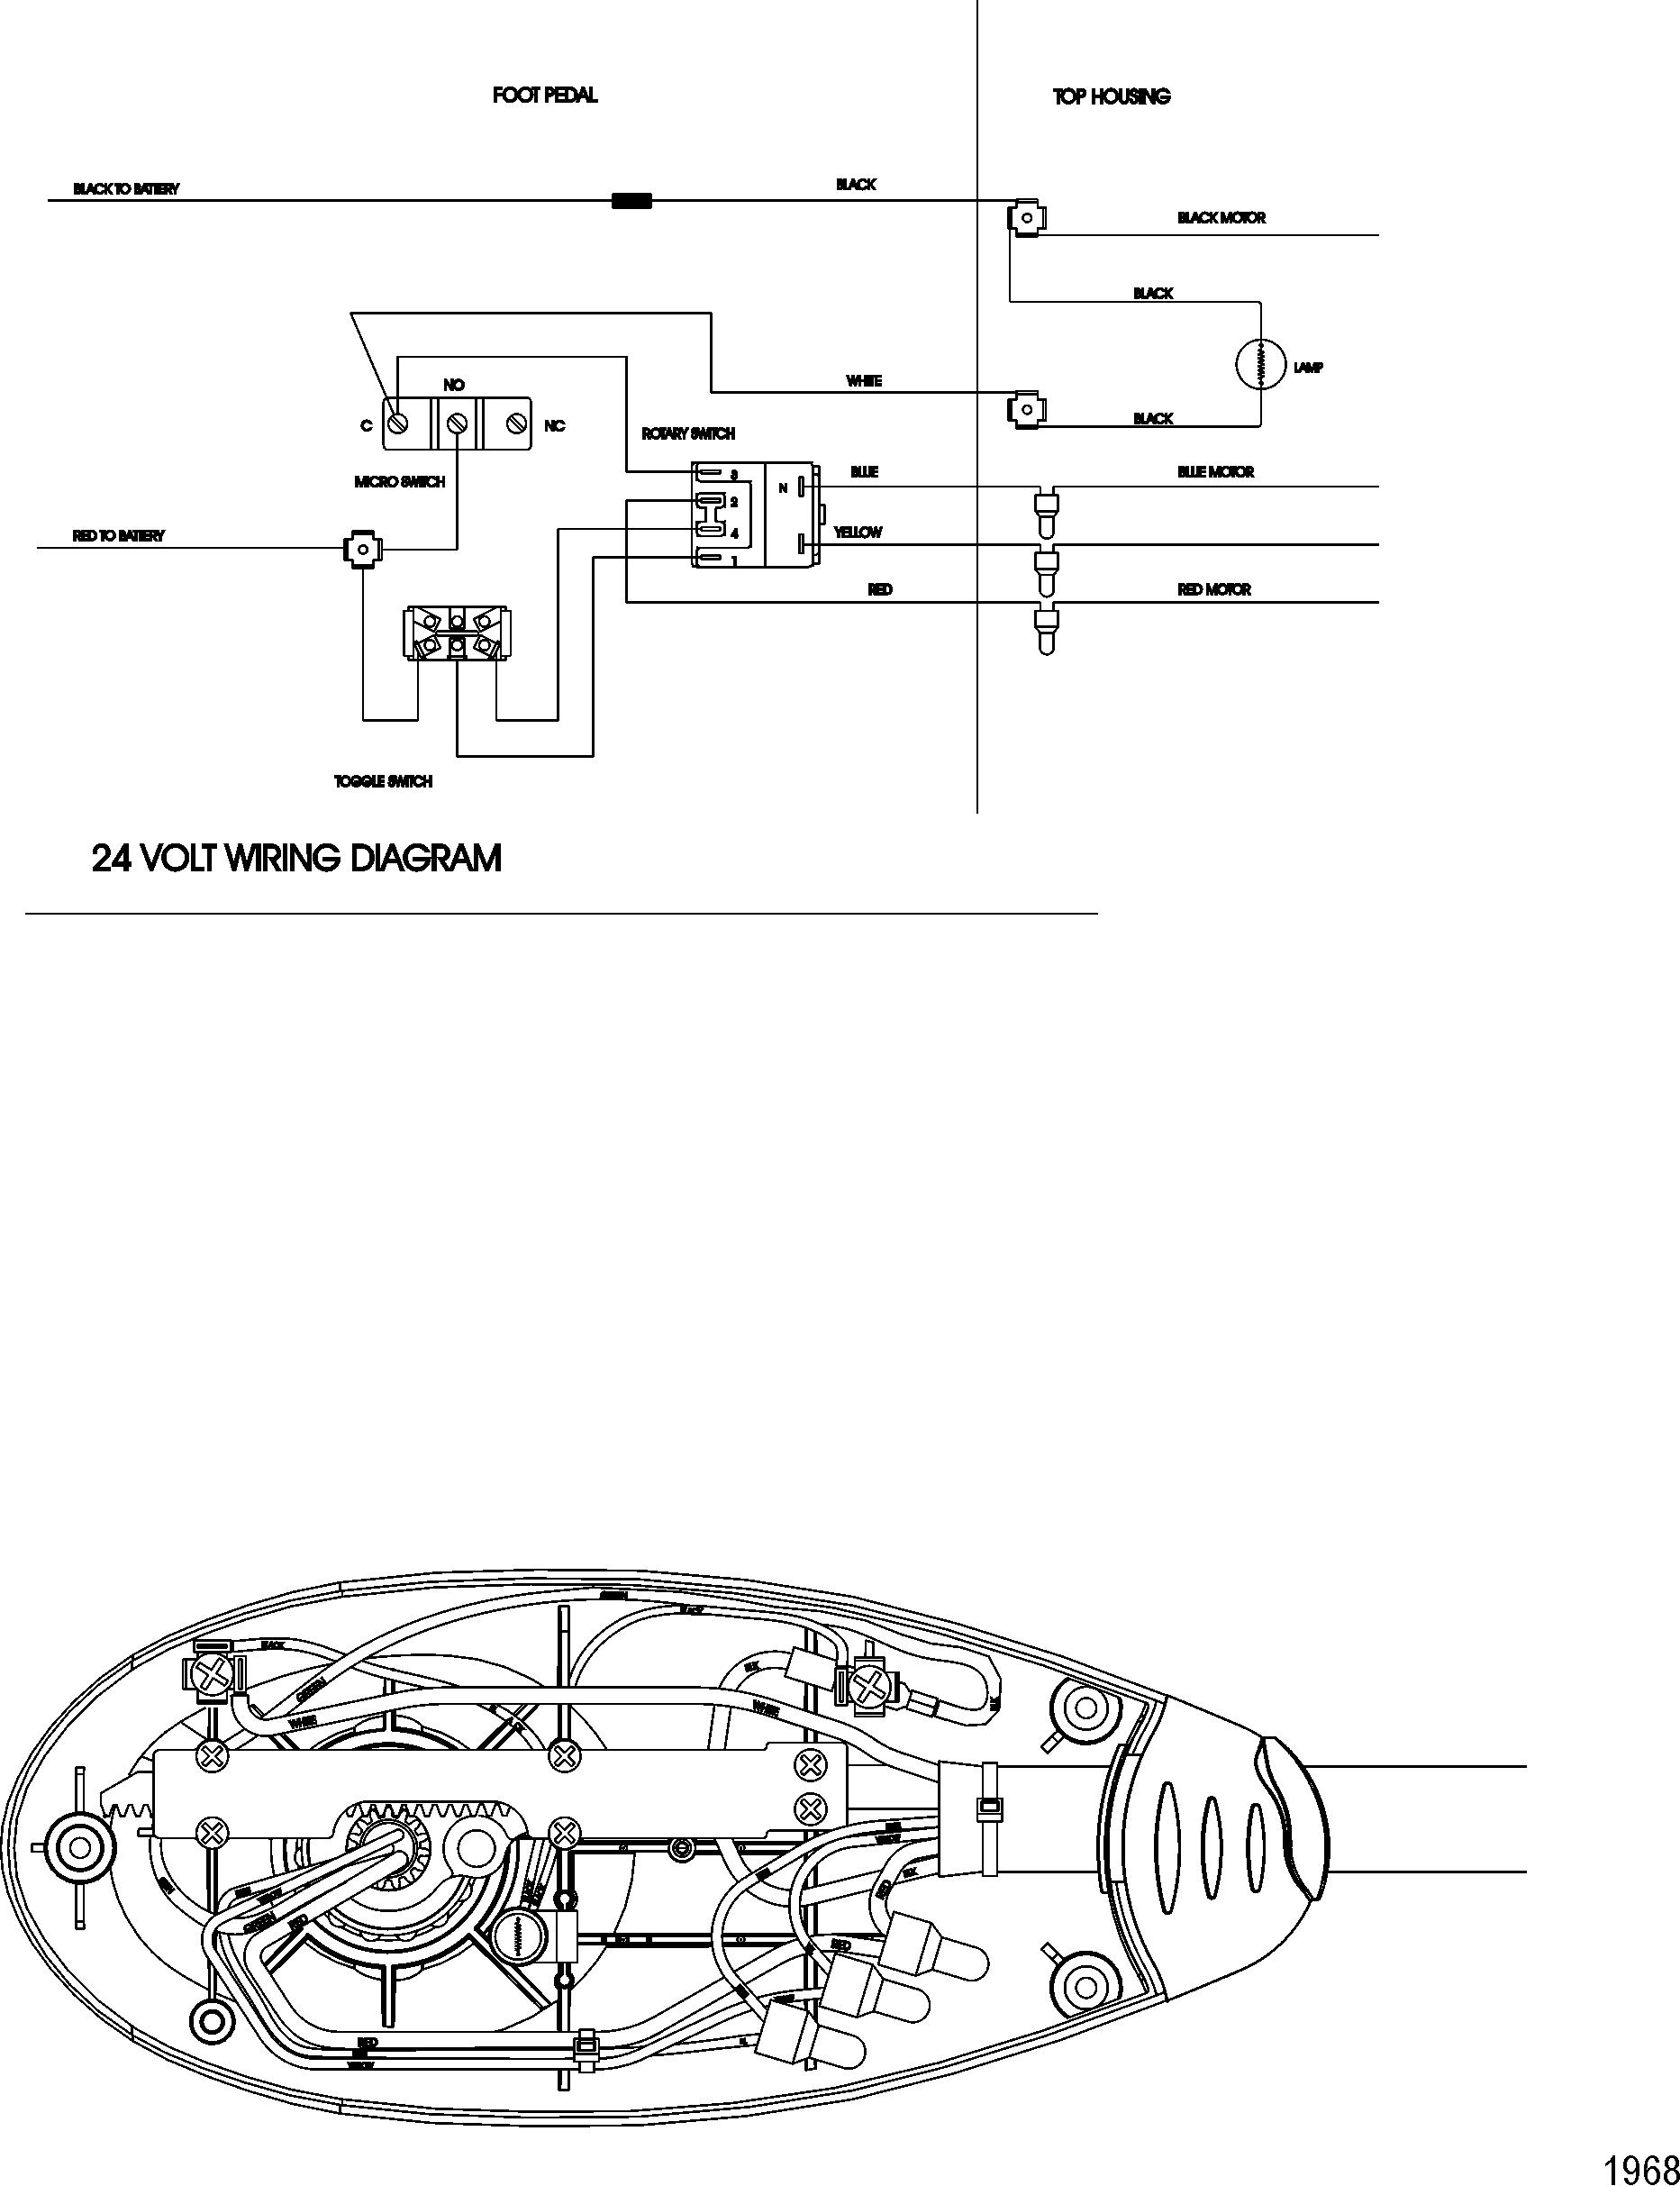 Motorguide Fw40db Wiring Diagram